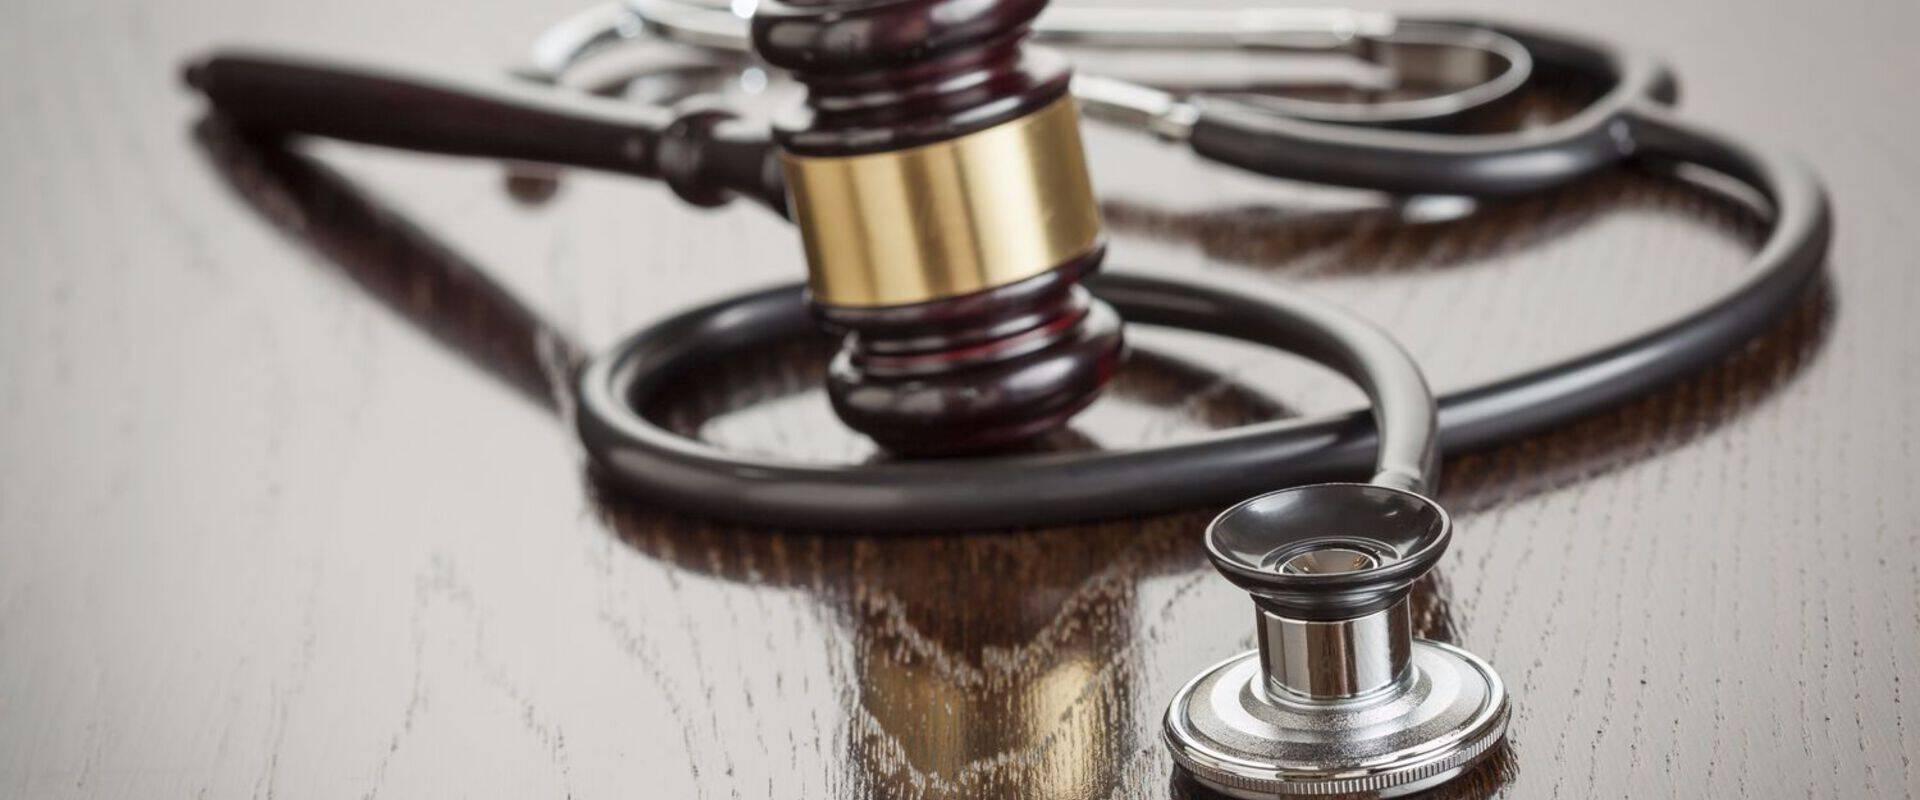 Catania Participates in CLE for Licensed Health Care Professionals